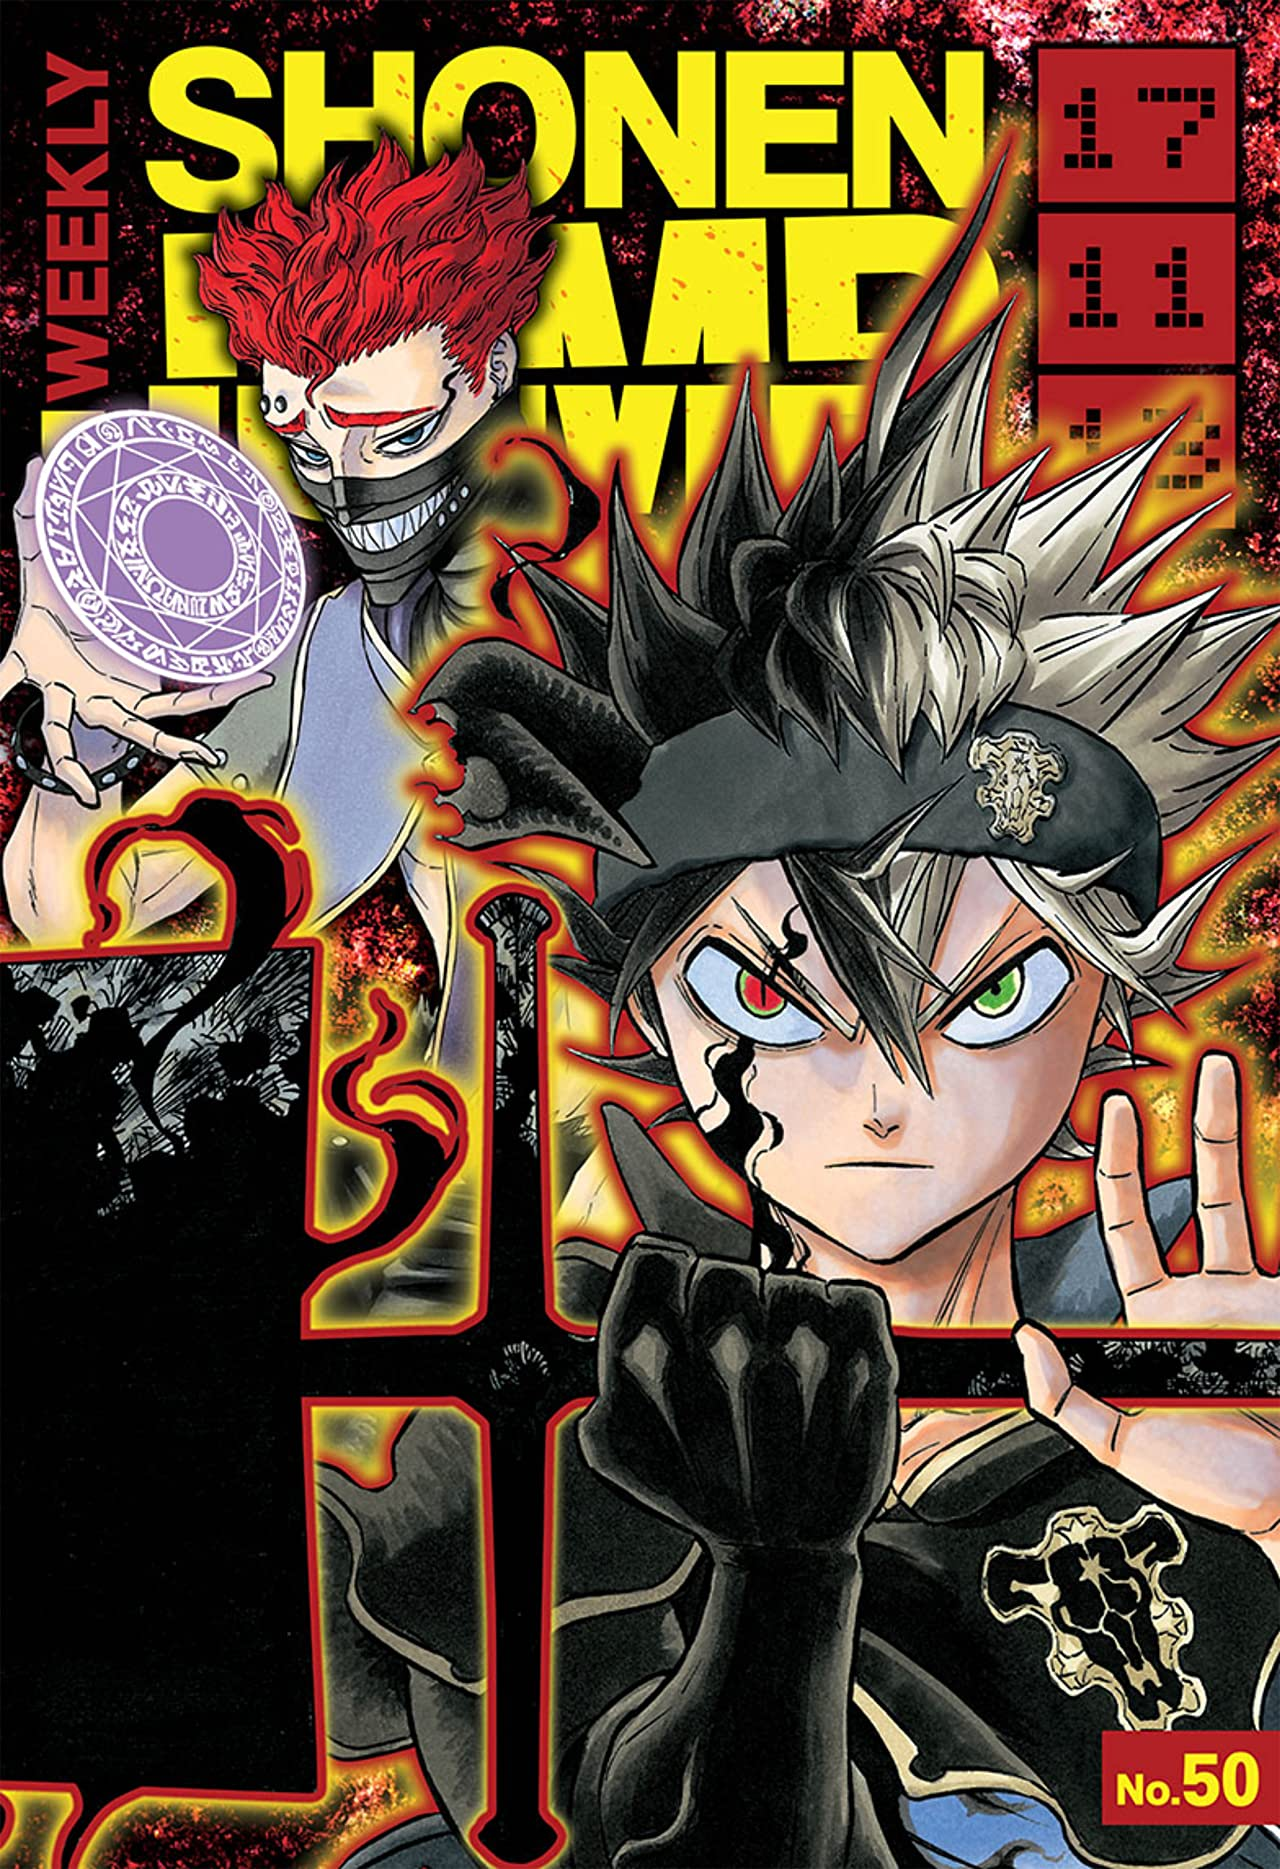 Weekly Shonen Jump Vol. 300: 11/13/2017